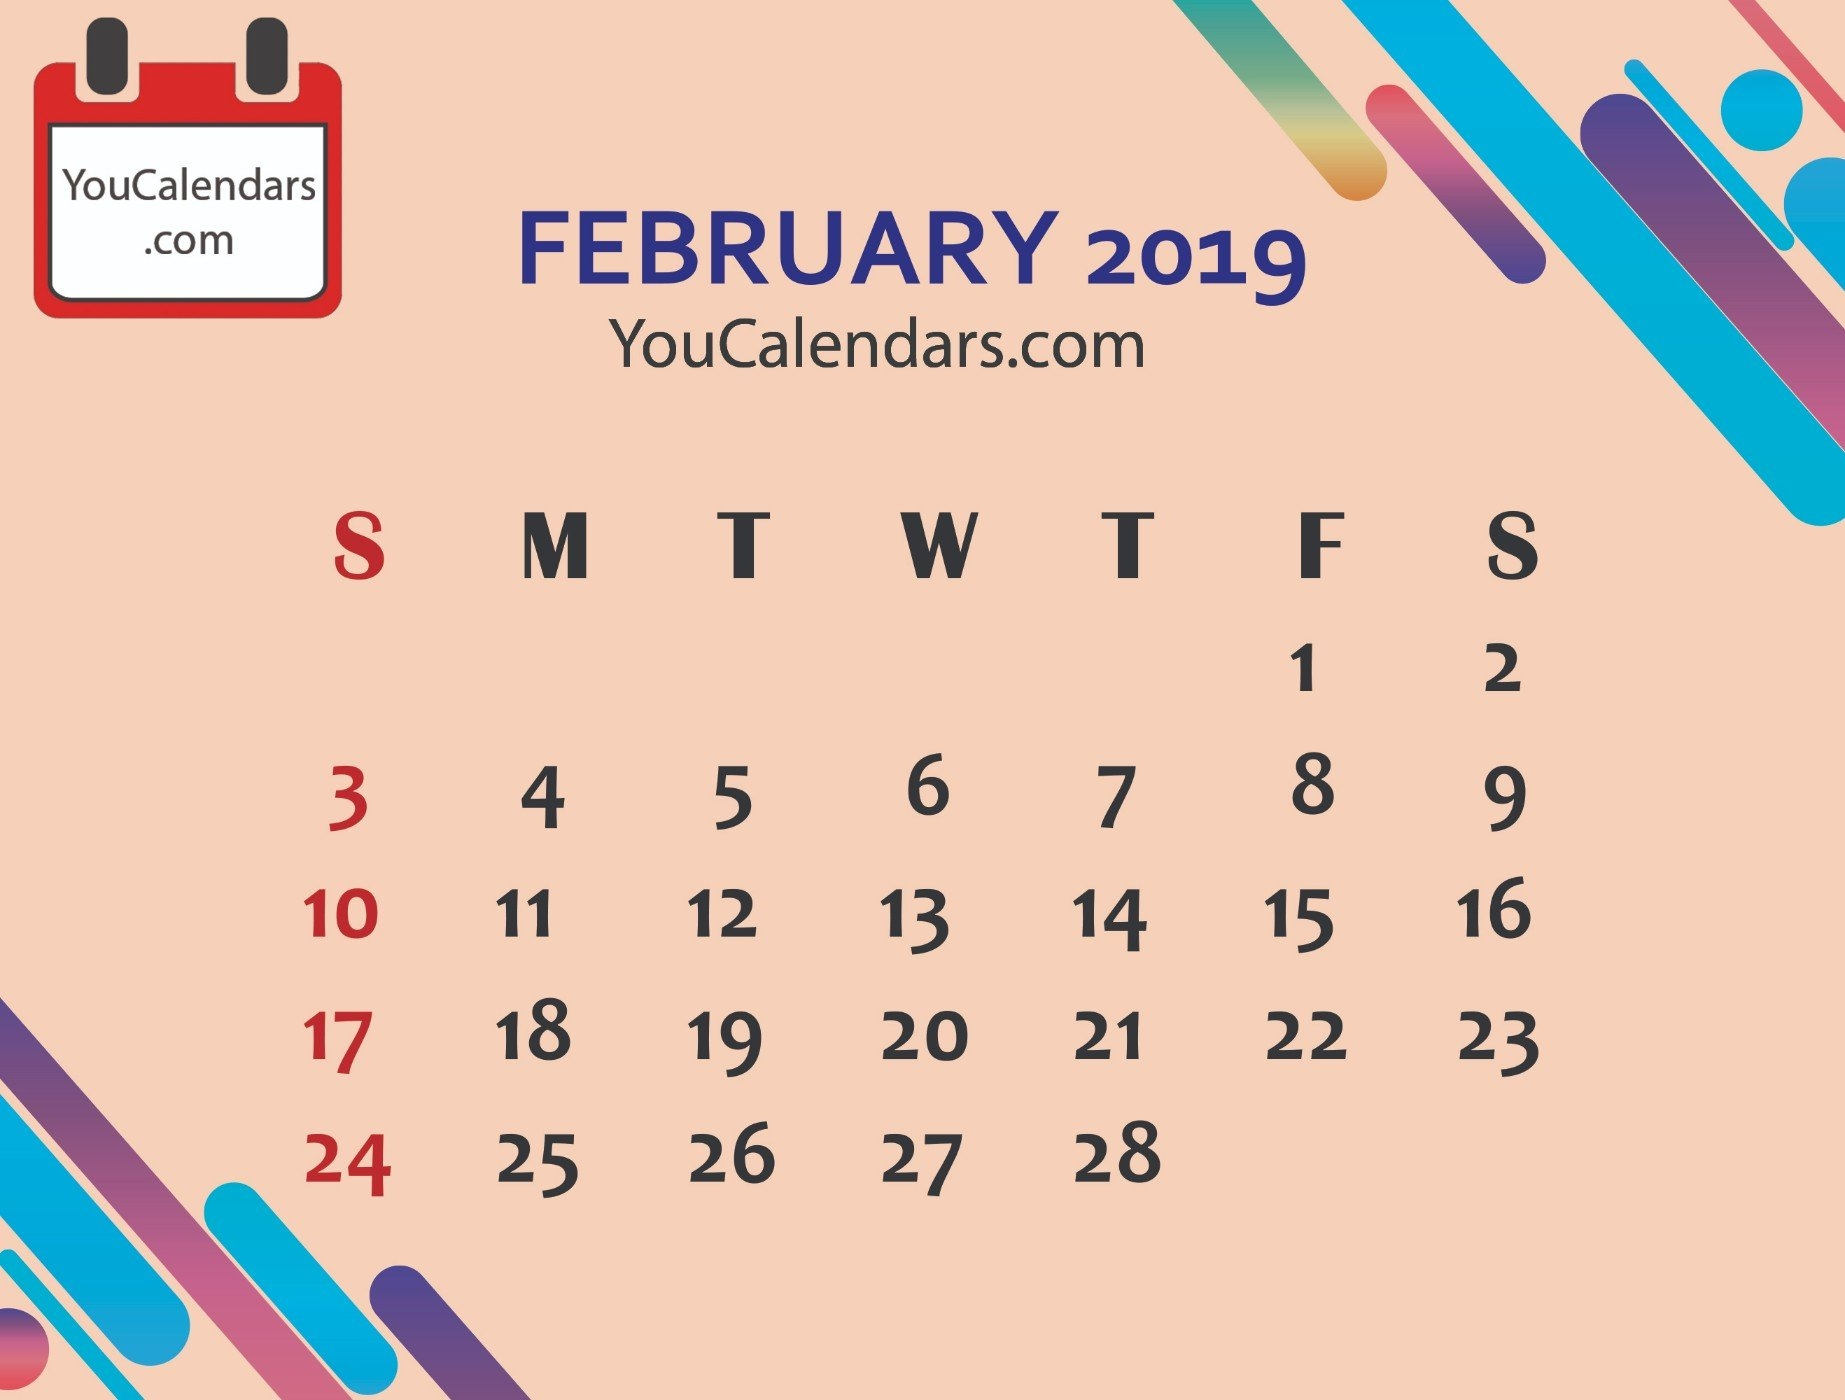 2019 Calendar Archives – You Calendars Feb 9 2019 Calendar